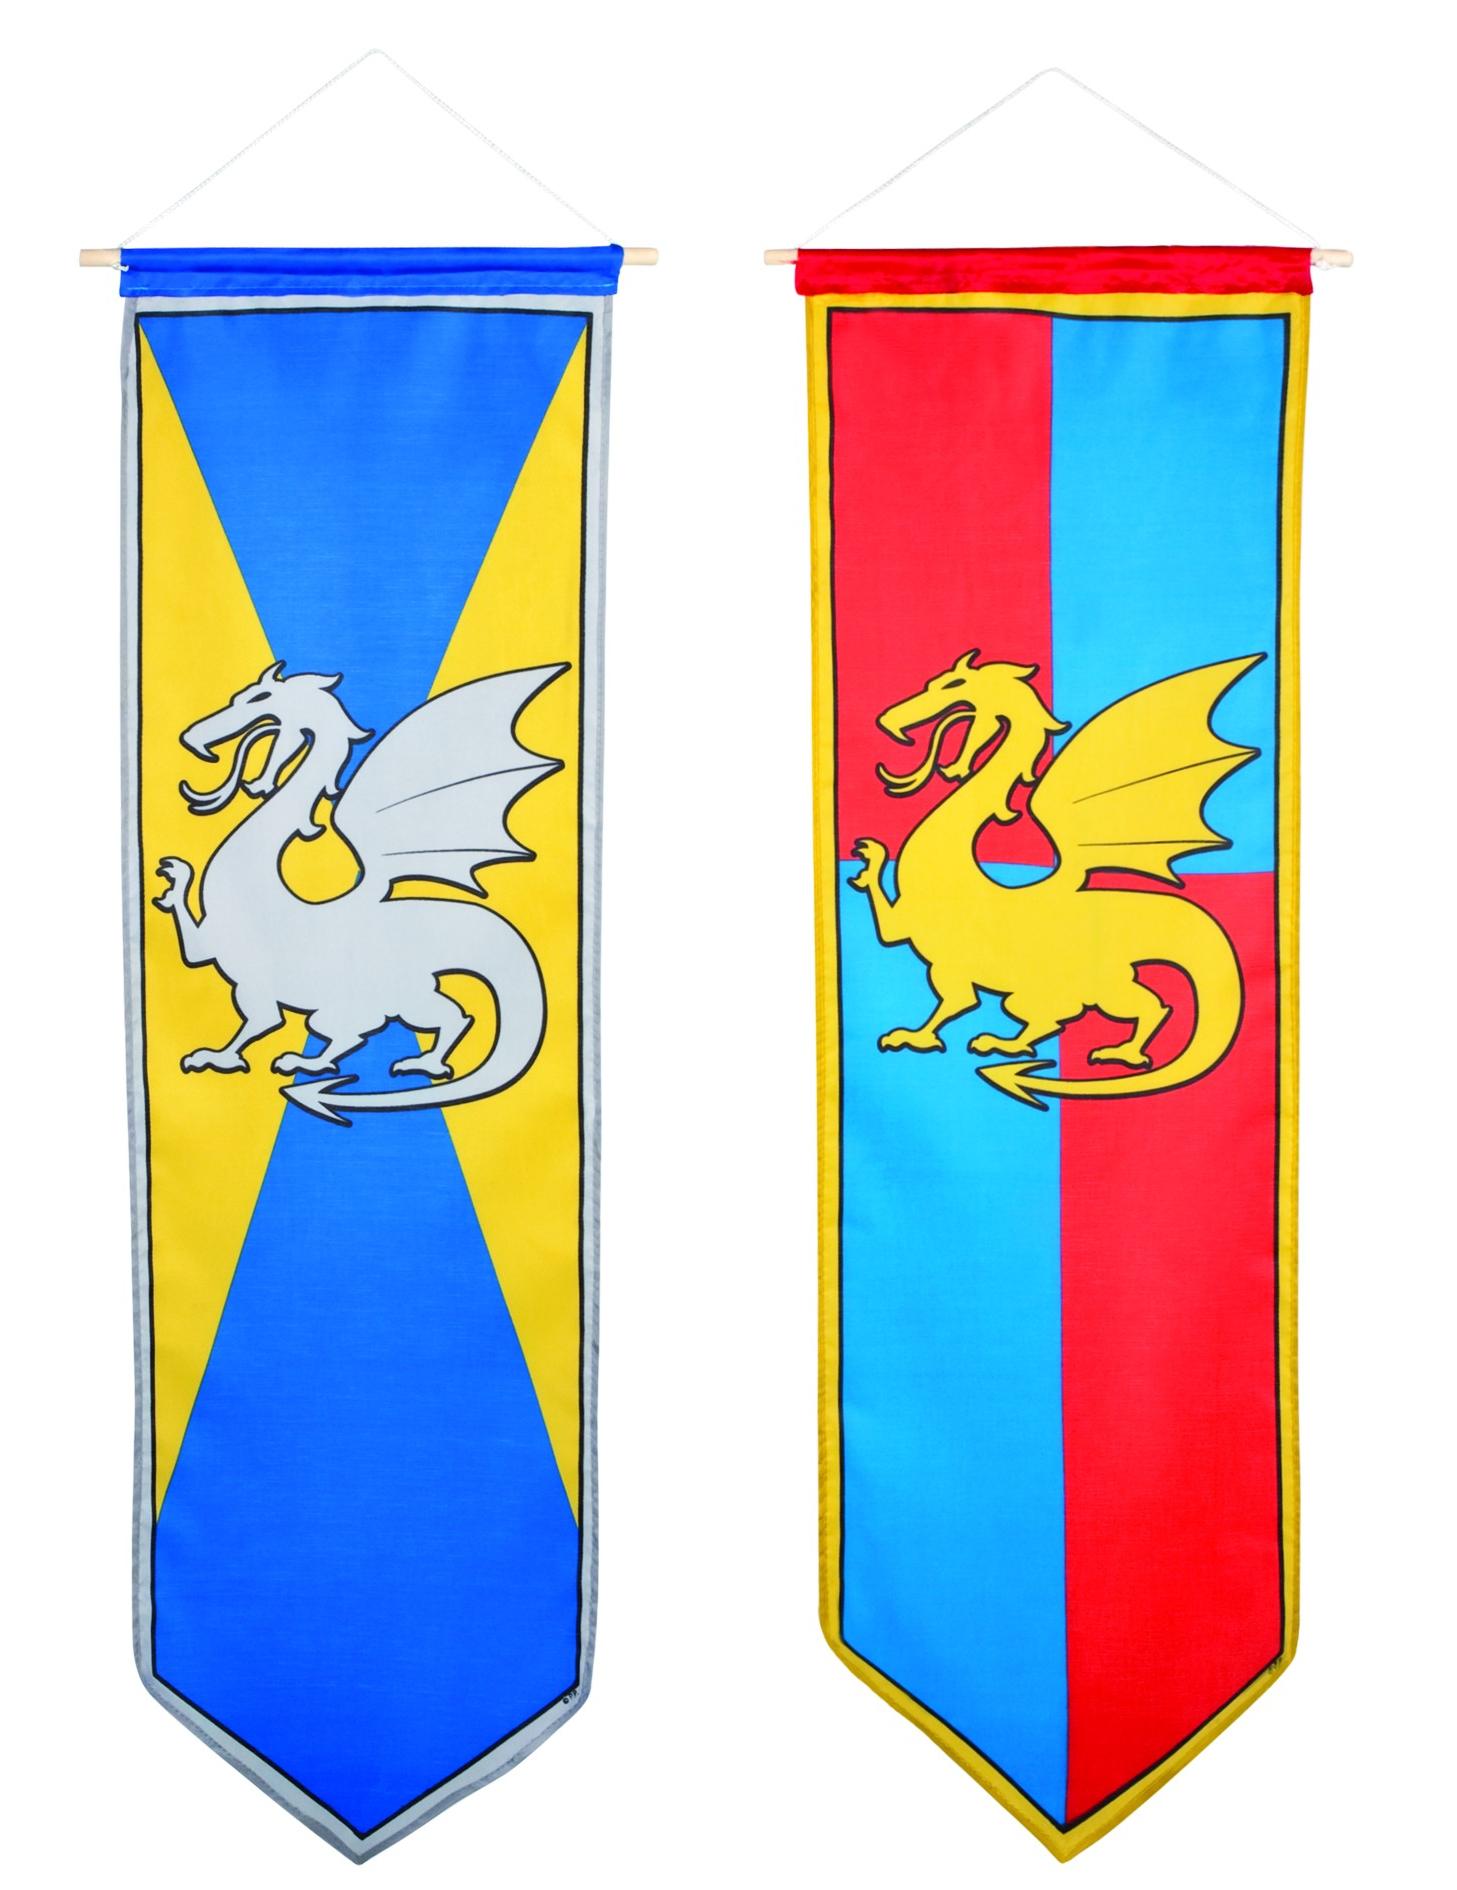 mittelalterliches ritter banner drachen wappen rot blau gelb 100x30cm g nstige faschings. Black Bedroom Furniture Sets. Home Design Ideas